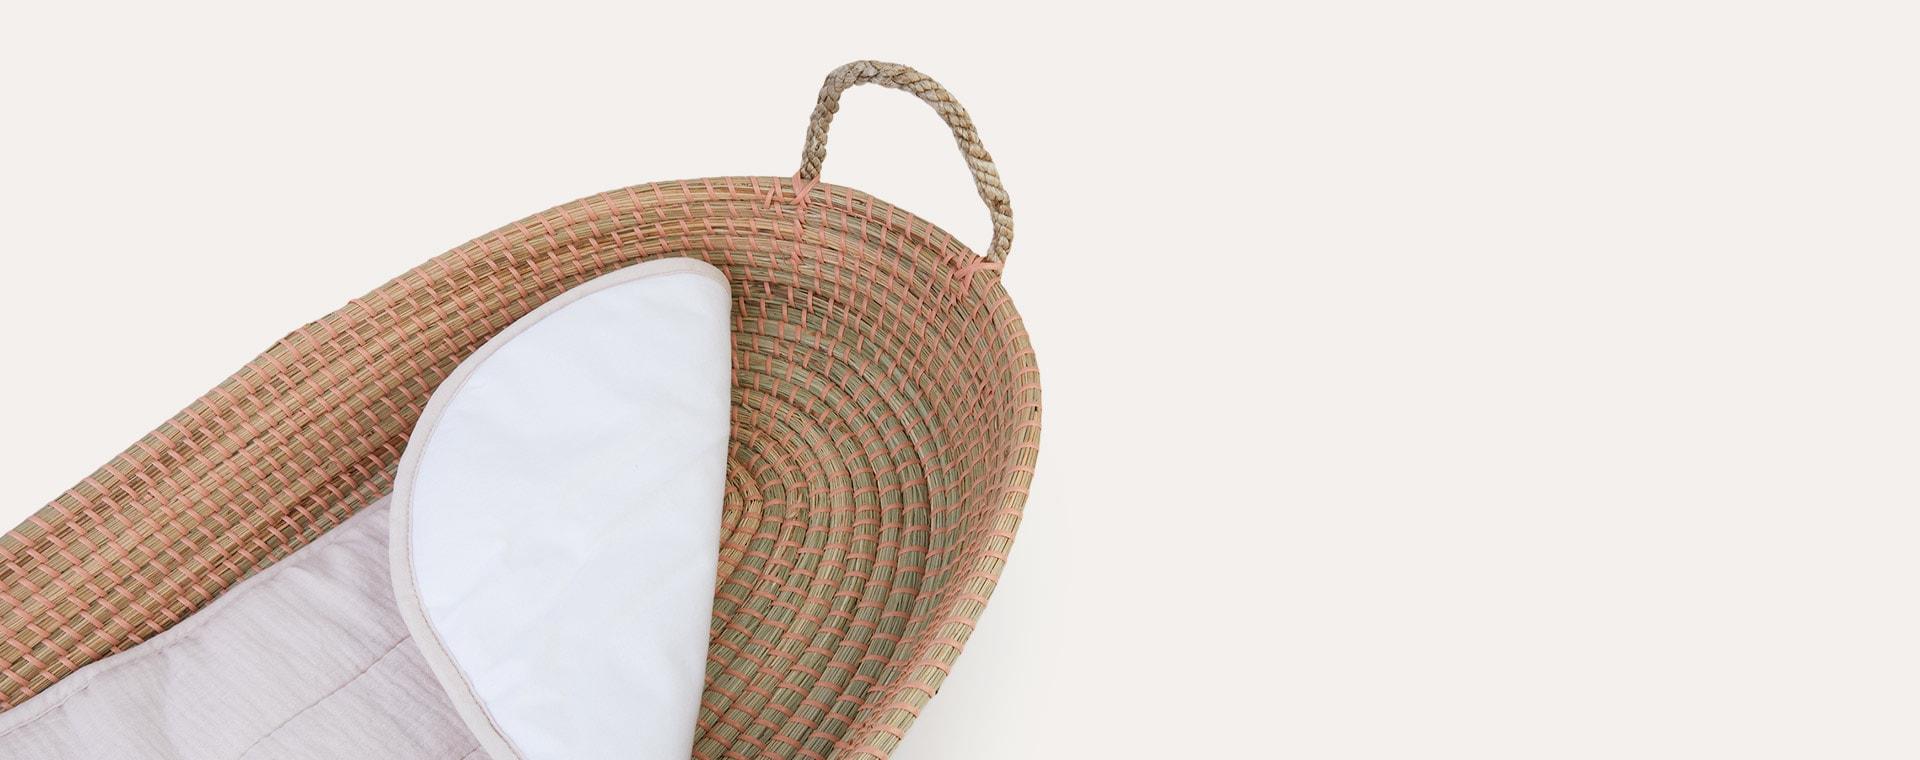 Oat Olli Ella Luxury Changing Basket Cotton Insert